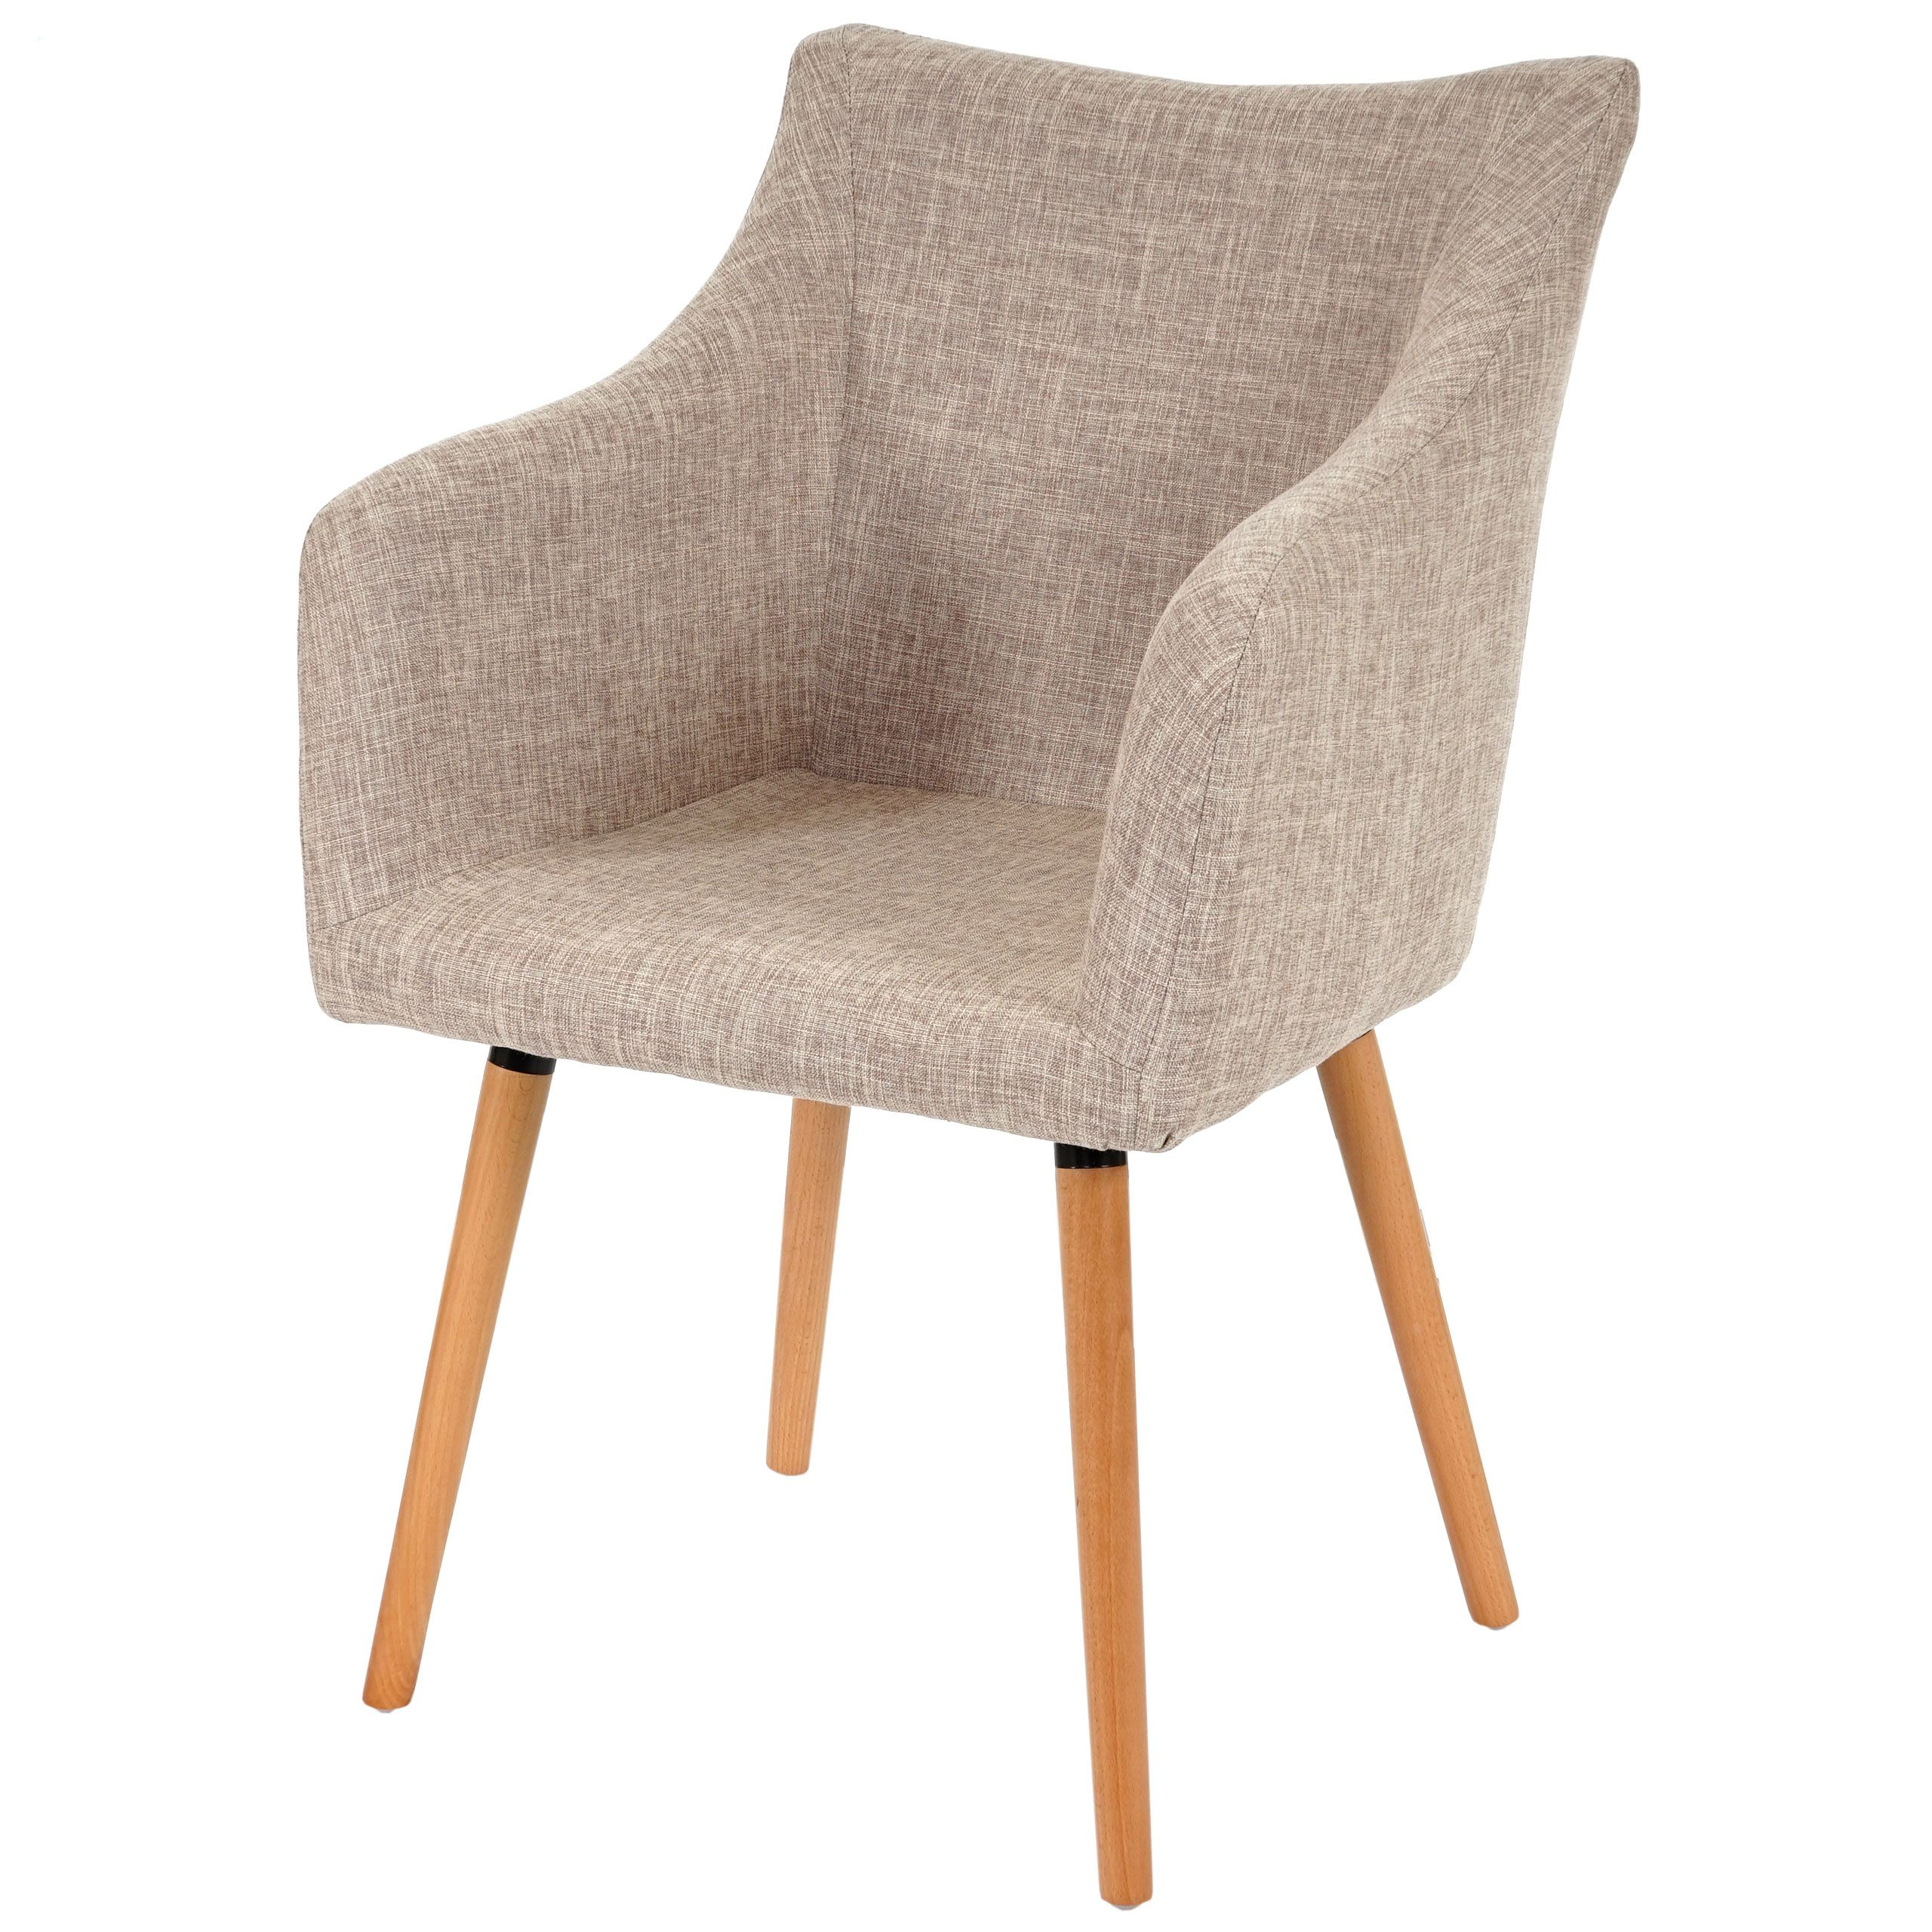 Esszimmerstuhl Malmo T382 Stuhl Lehnstuhl Retro 50er Jahre Design Textil Creme Grau